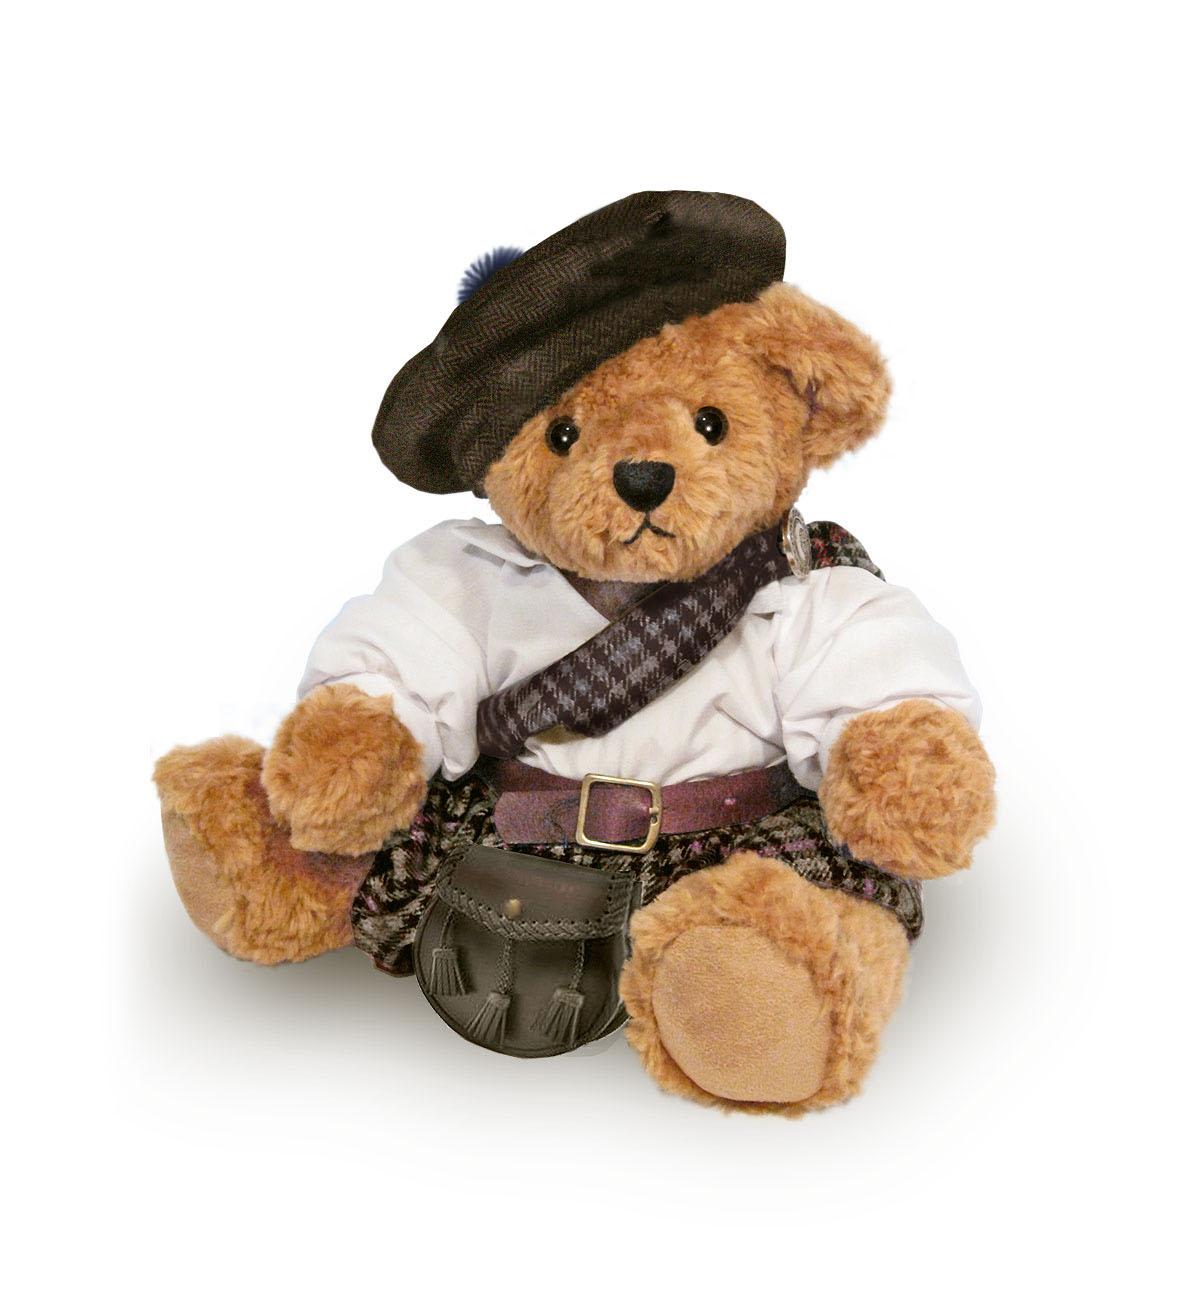 Cute Crisp Wallpapers Rachels Bears The Great British Teddy Bear Historical